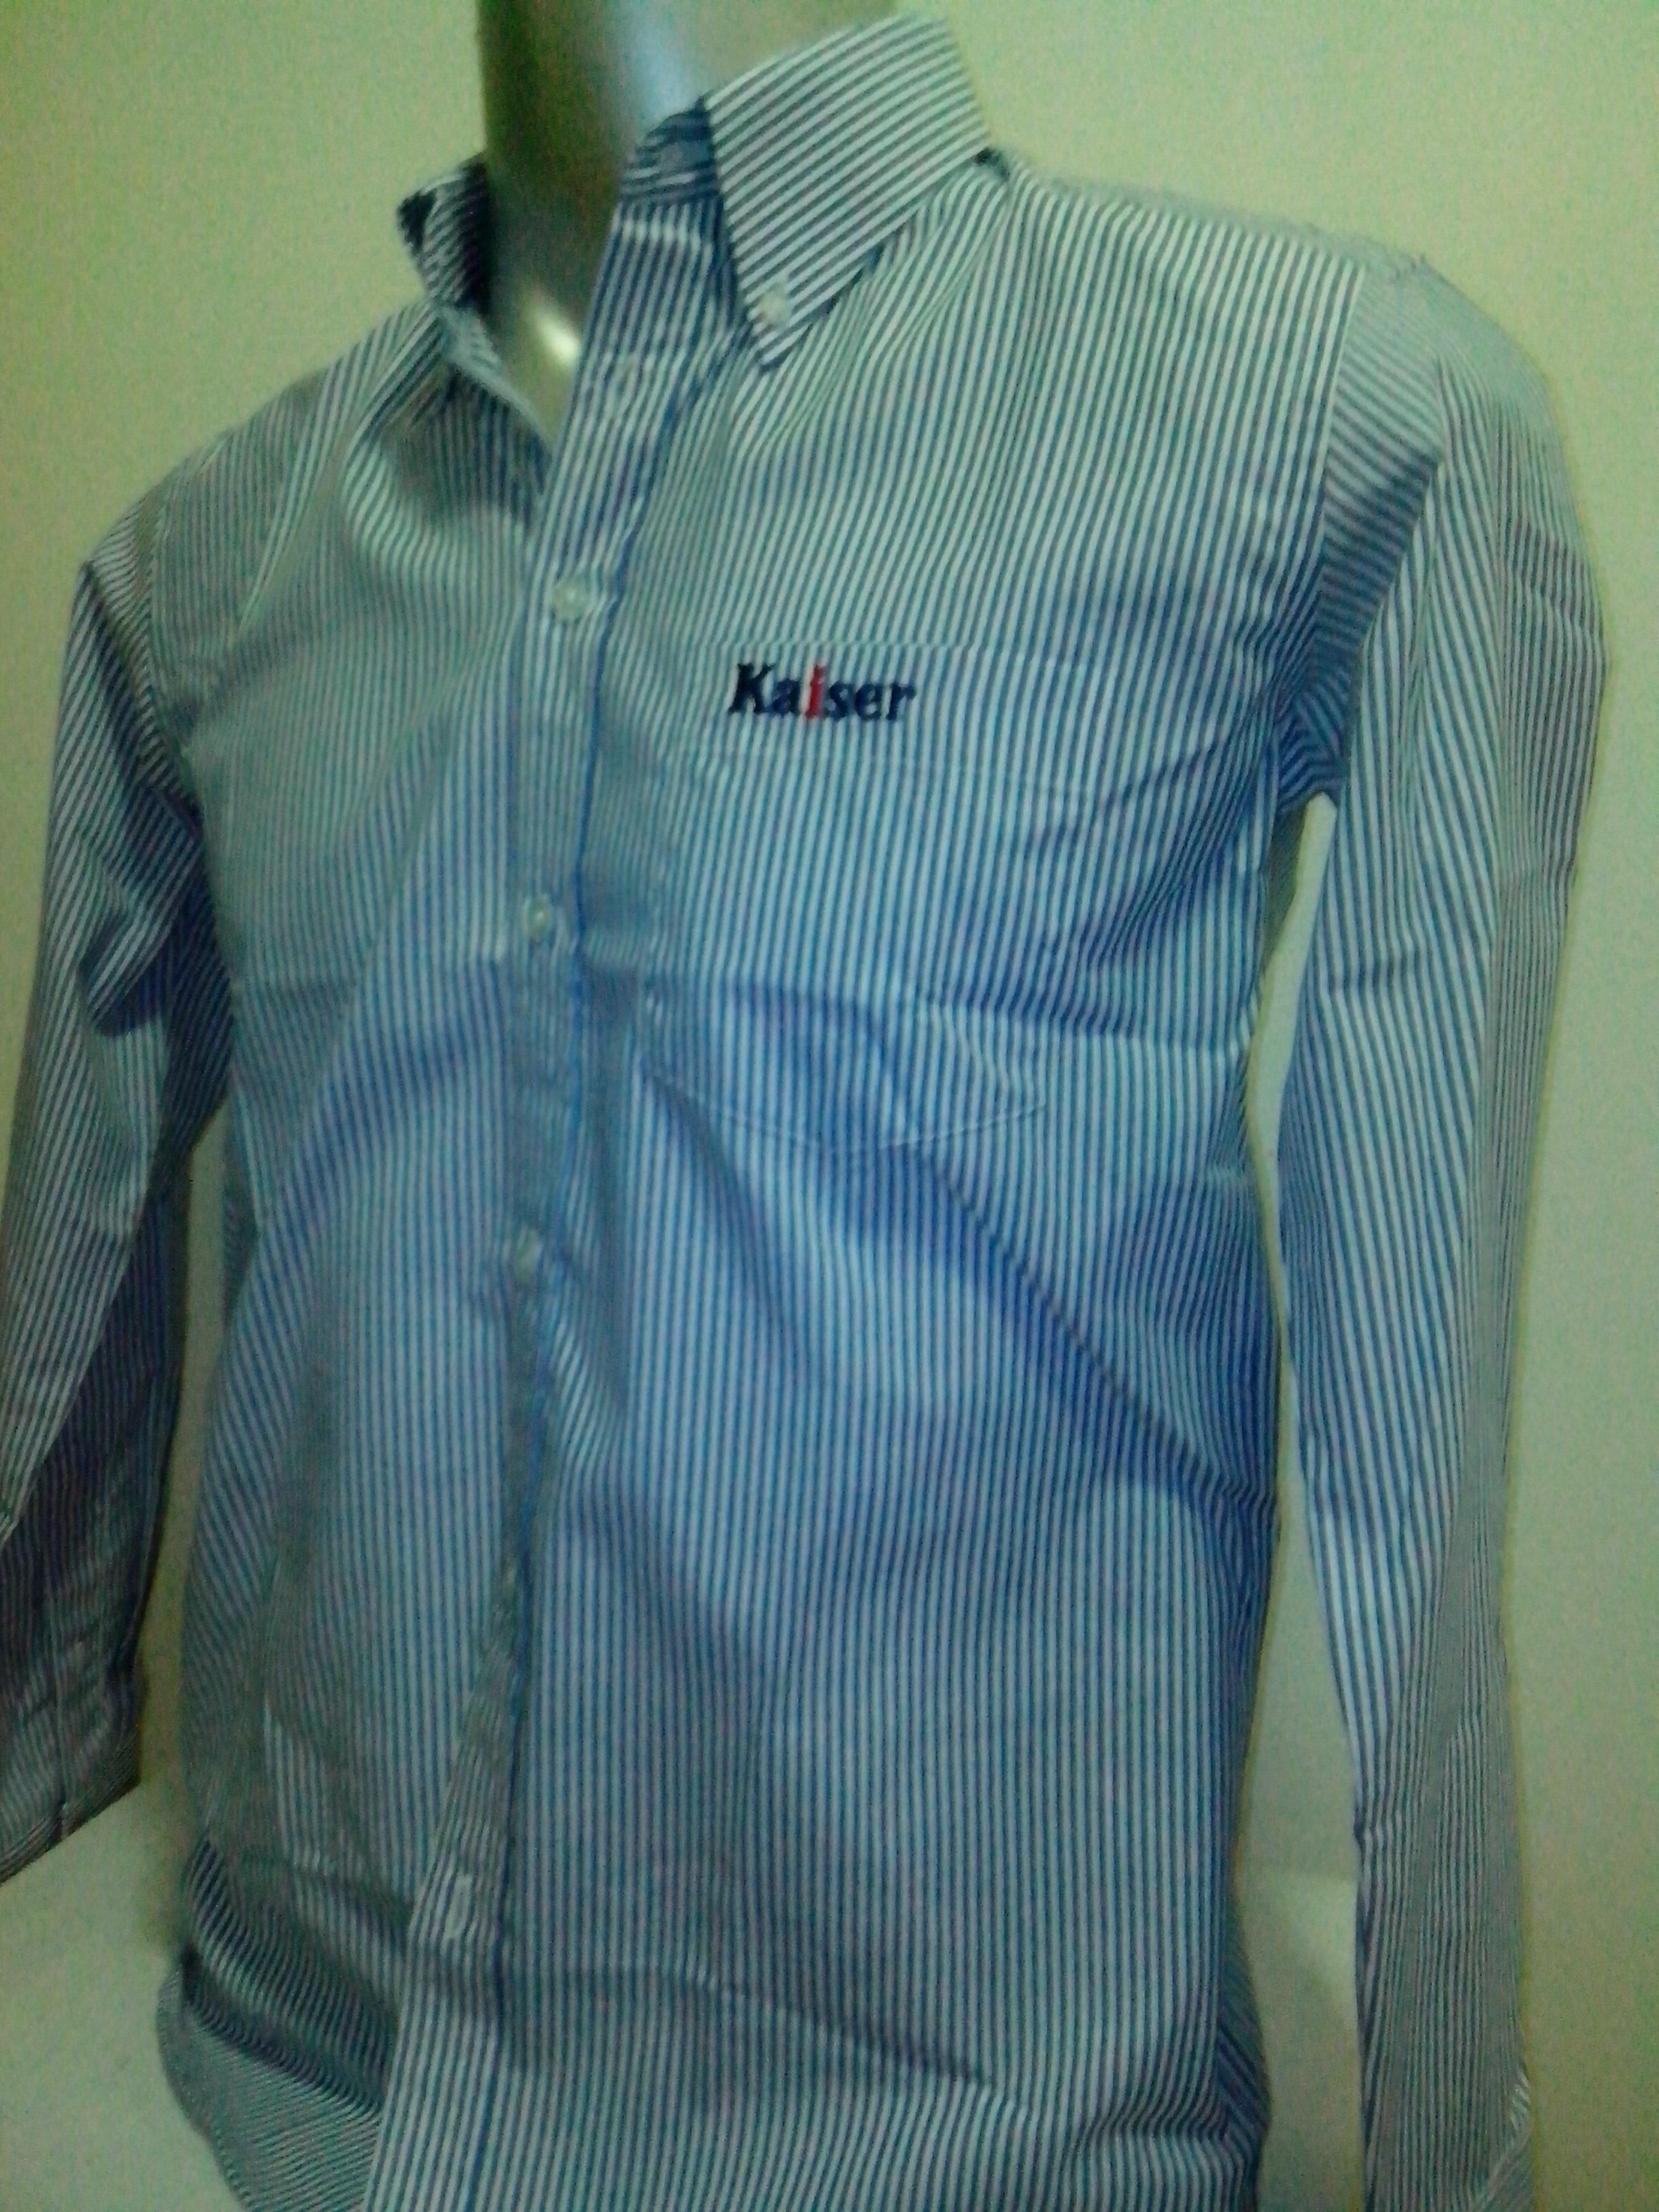 SHIRTS001 เสื้อเชิ้ต